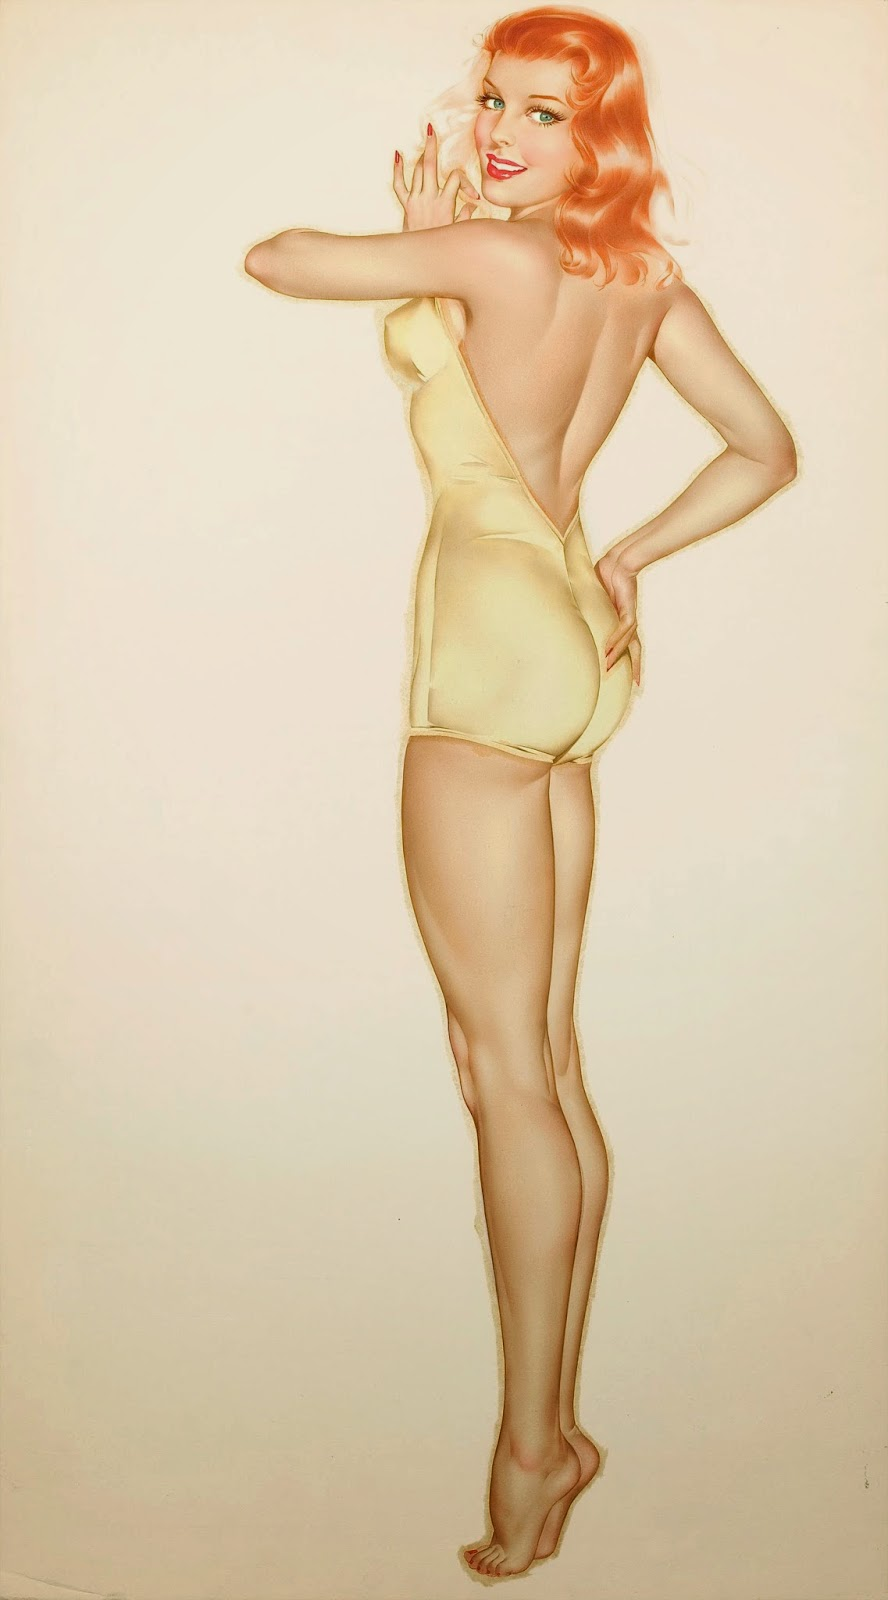 Alberto Vargas classic pinup art woman